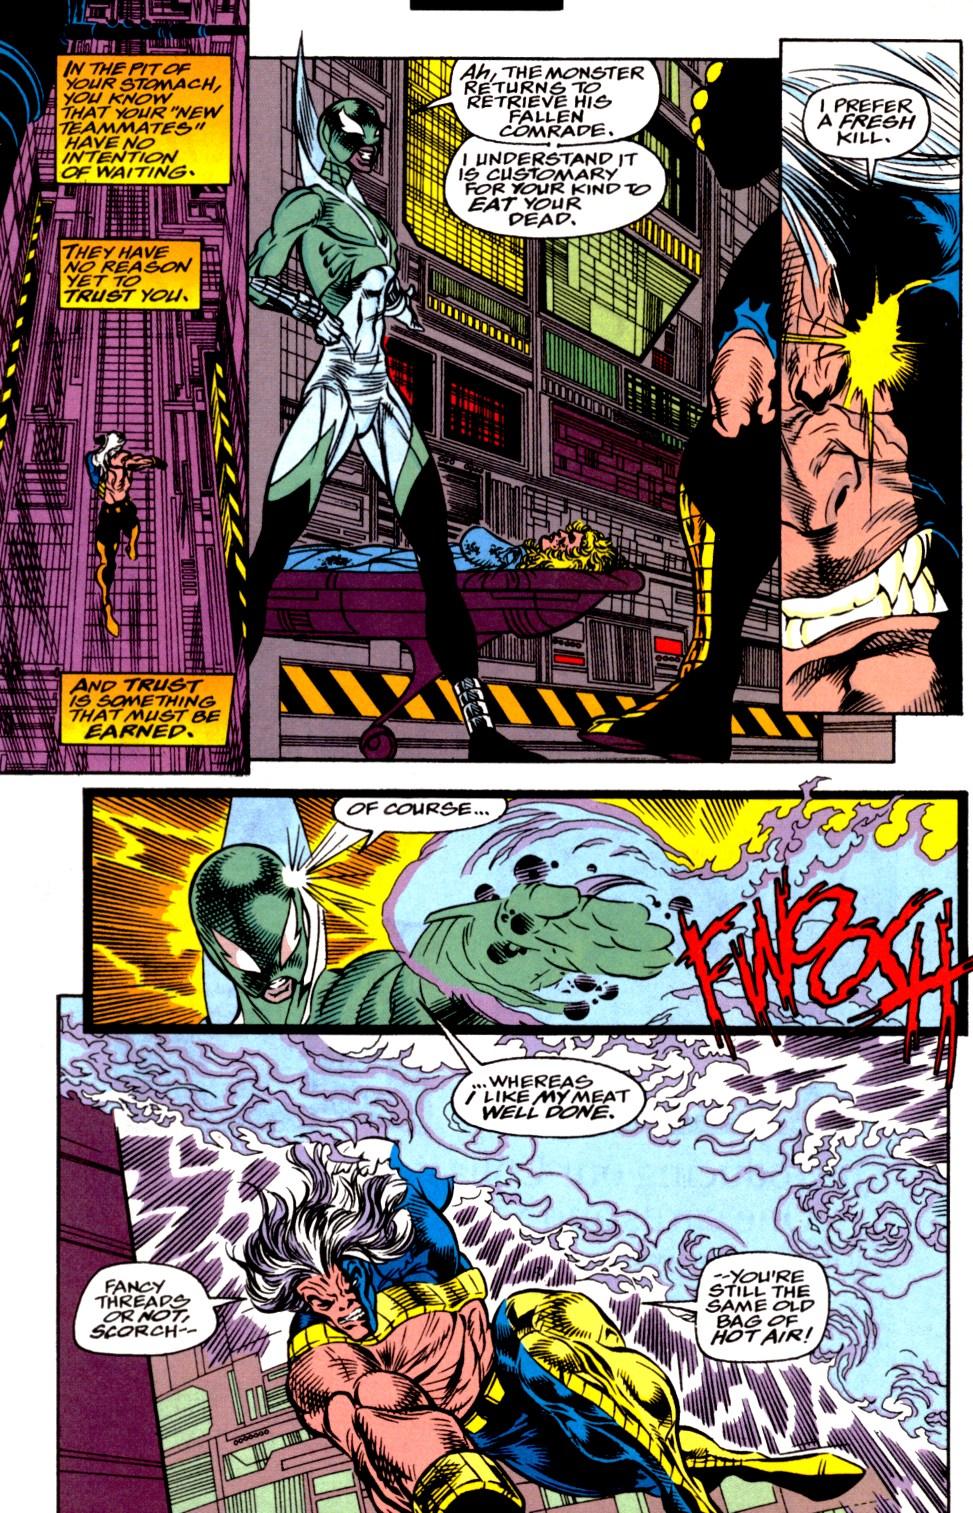 Read online Blackwulf comic -  Issue #4 - 7